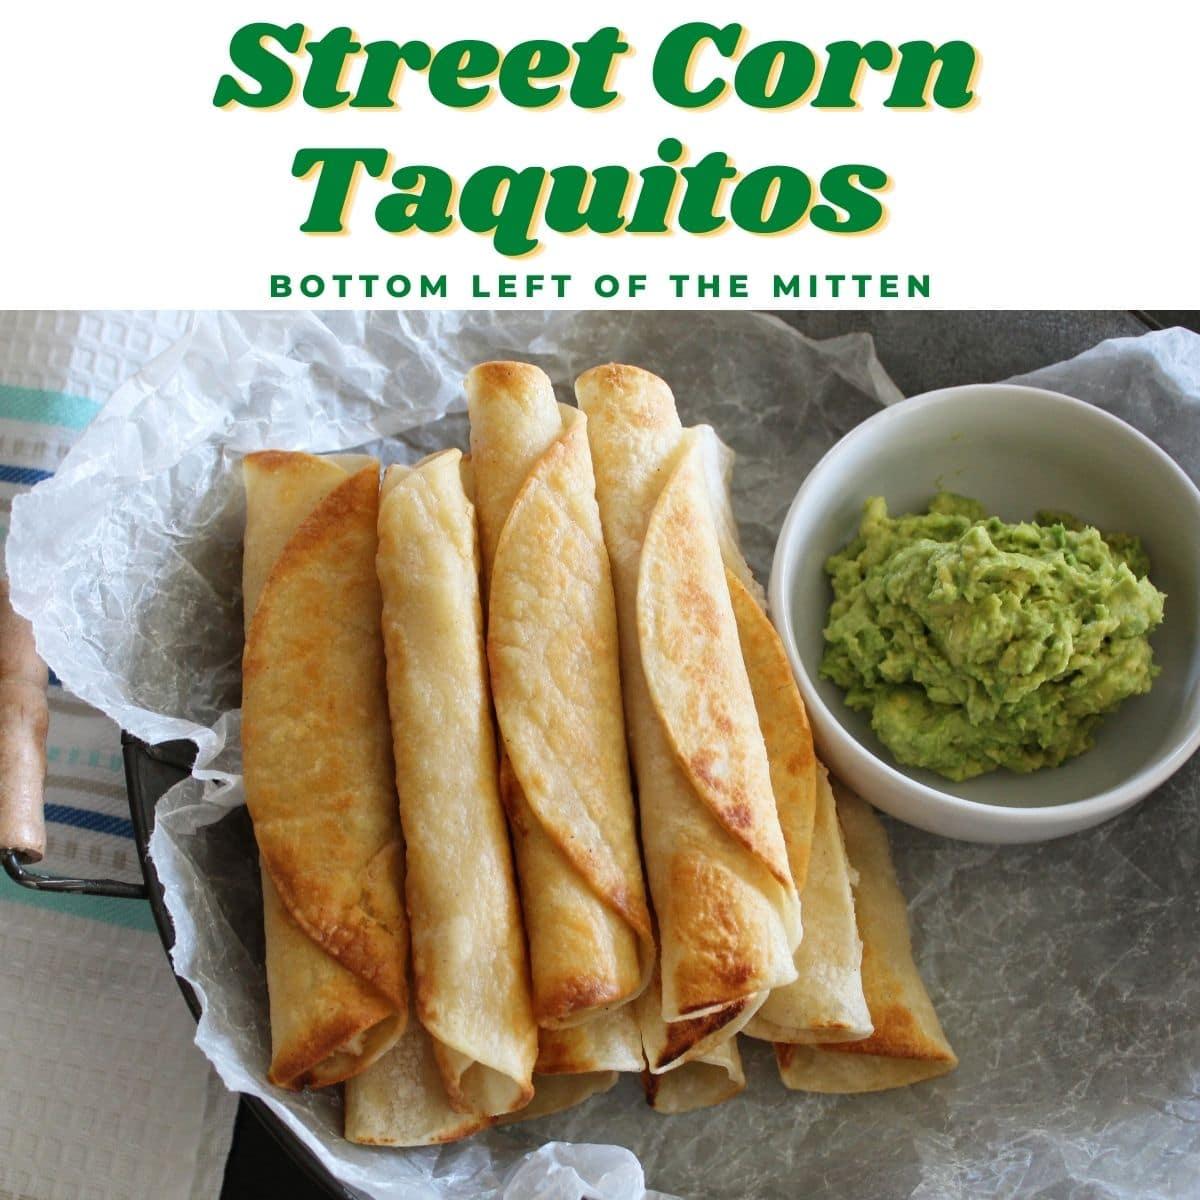 Street Corn Taquitos | Bottom Left of the Mitten